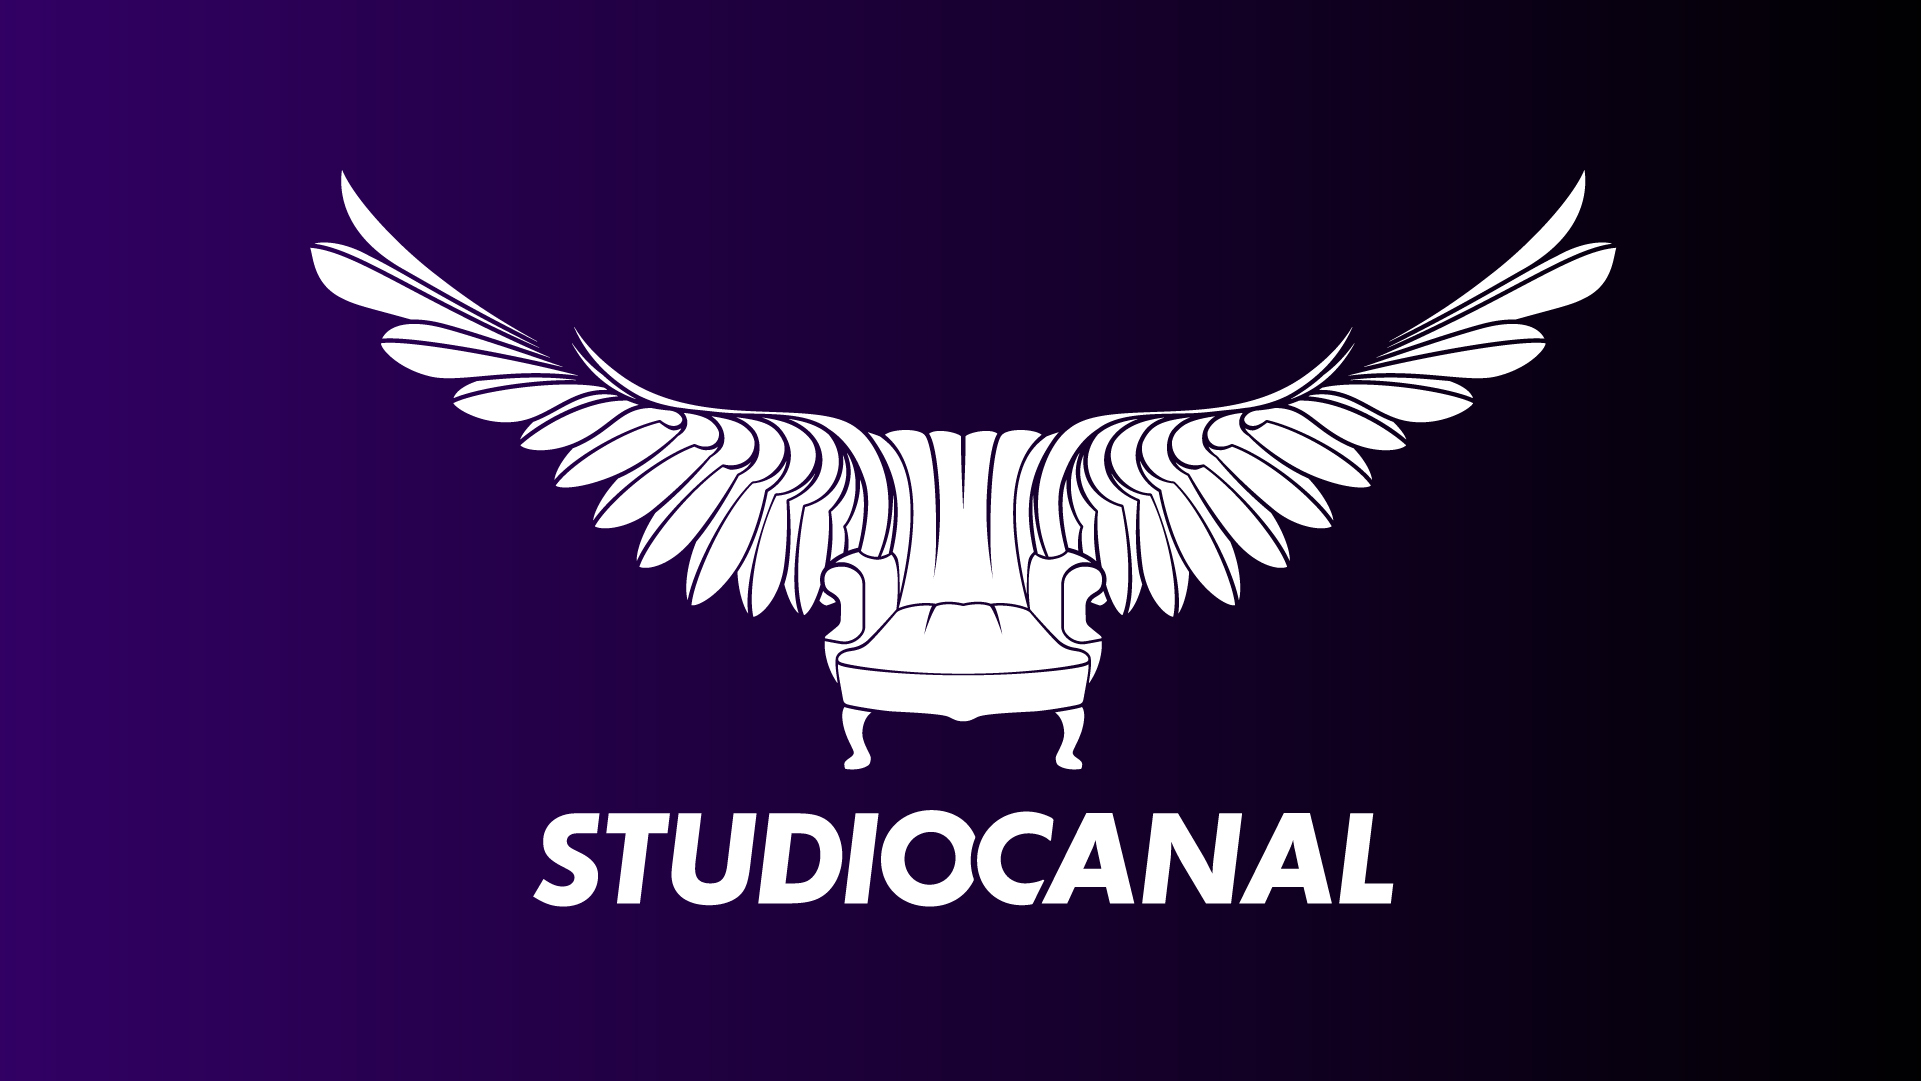 Logo: Flying chair for Studiocanal